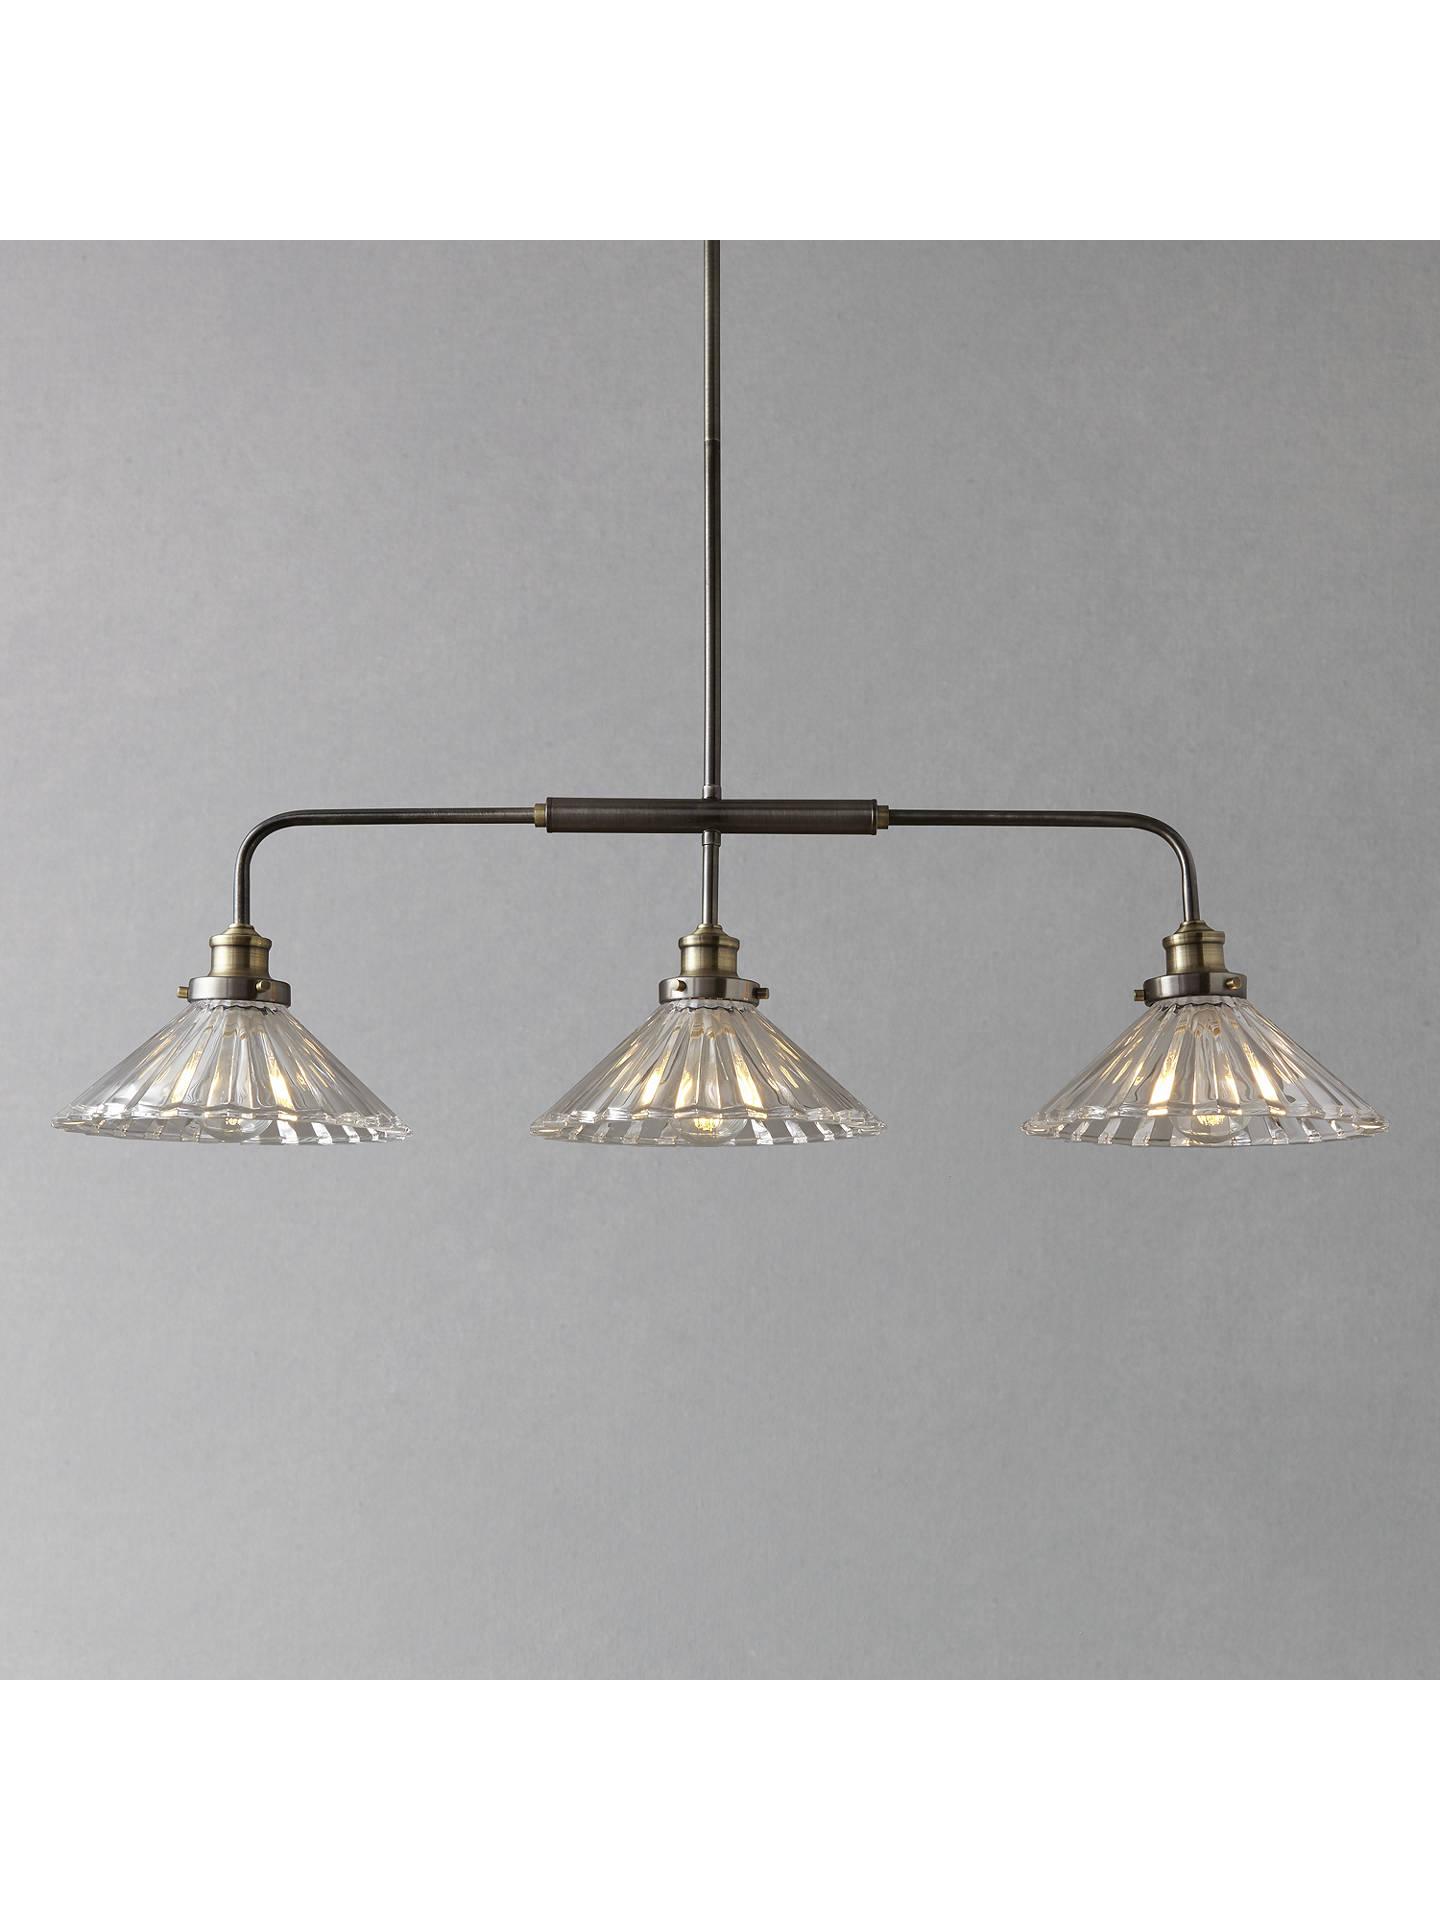 John Lewis Partners Phineas 3 Bar Pendant Light At